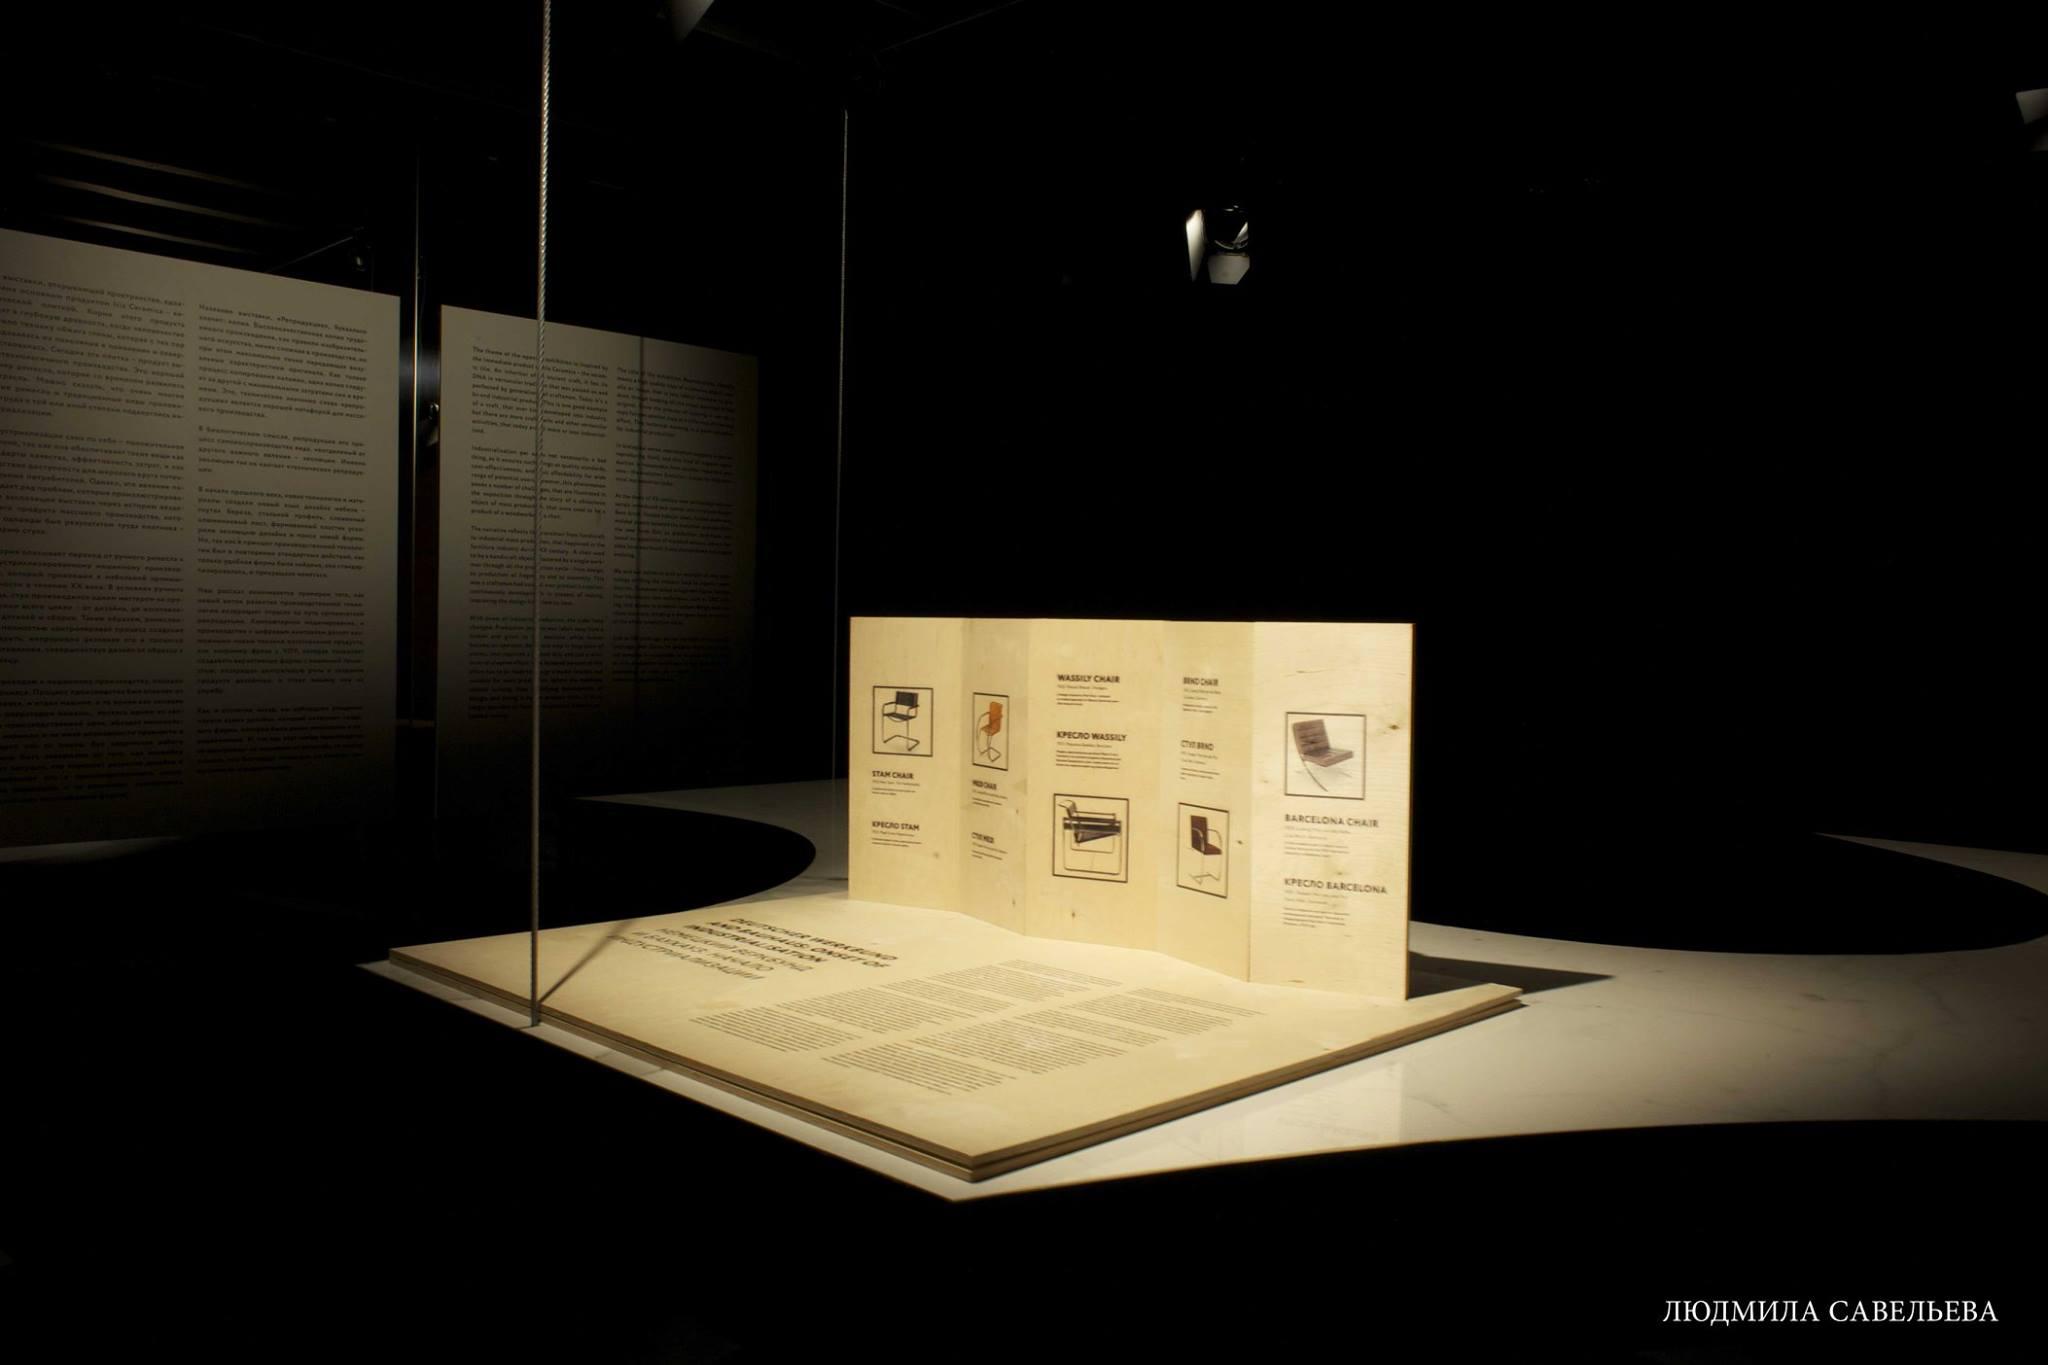 Riproduzione super surface space for Riproduzioni design